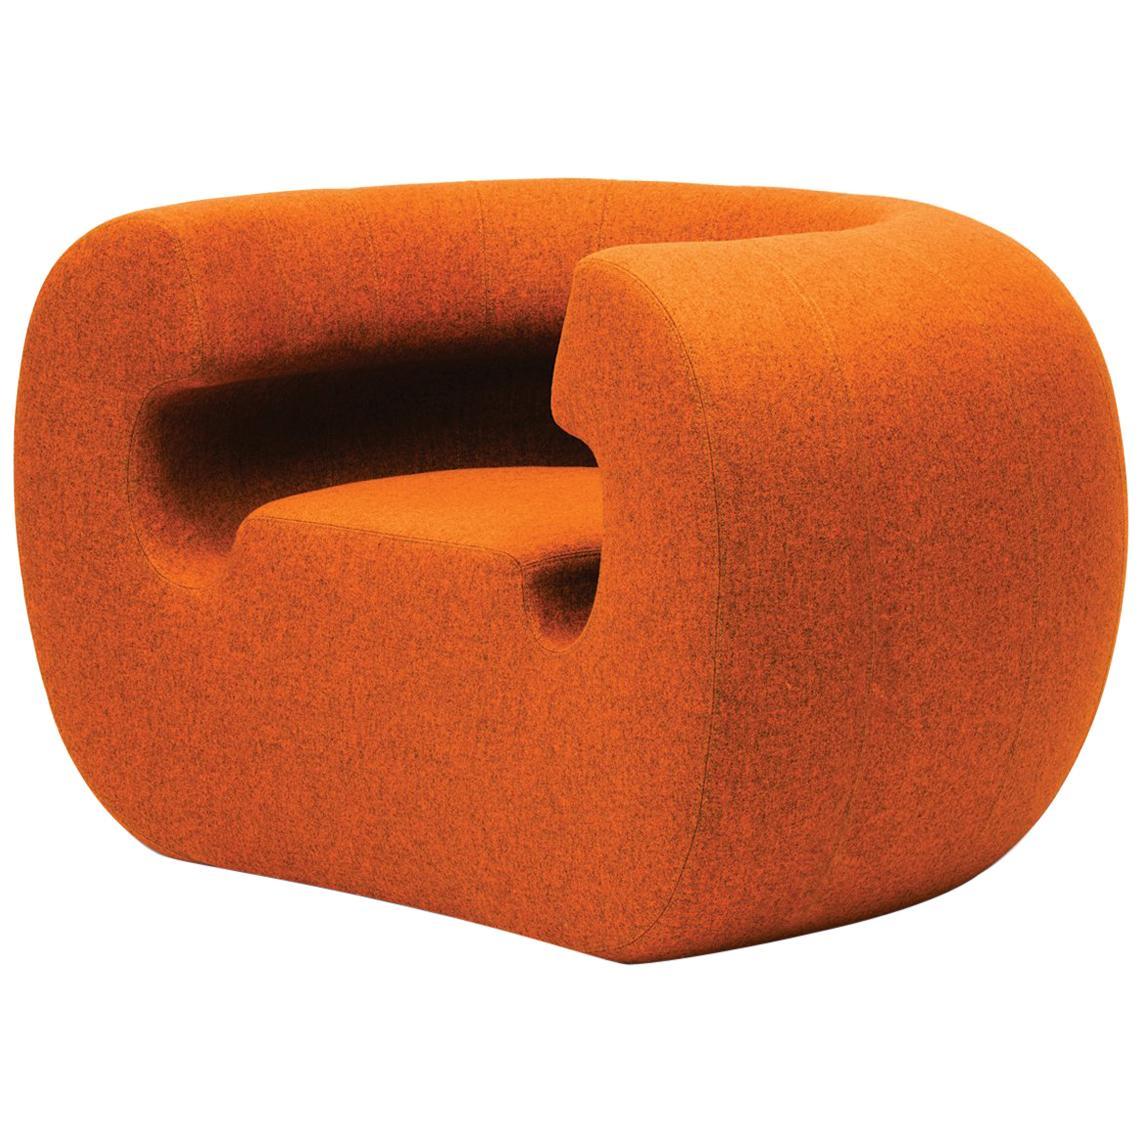 Gufram Roxanne Armchair in Orange Melange by Michael Young